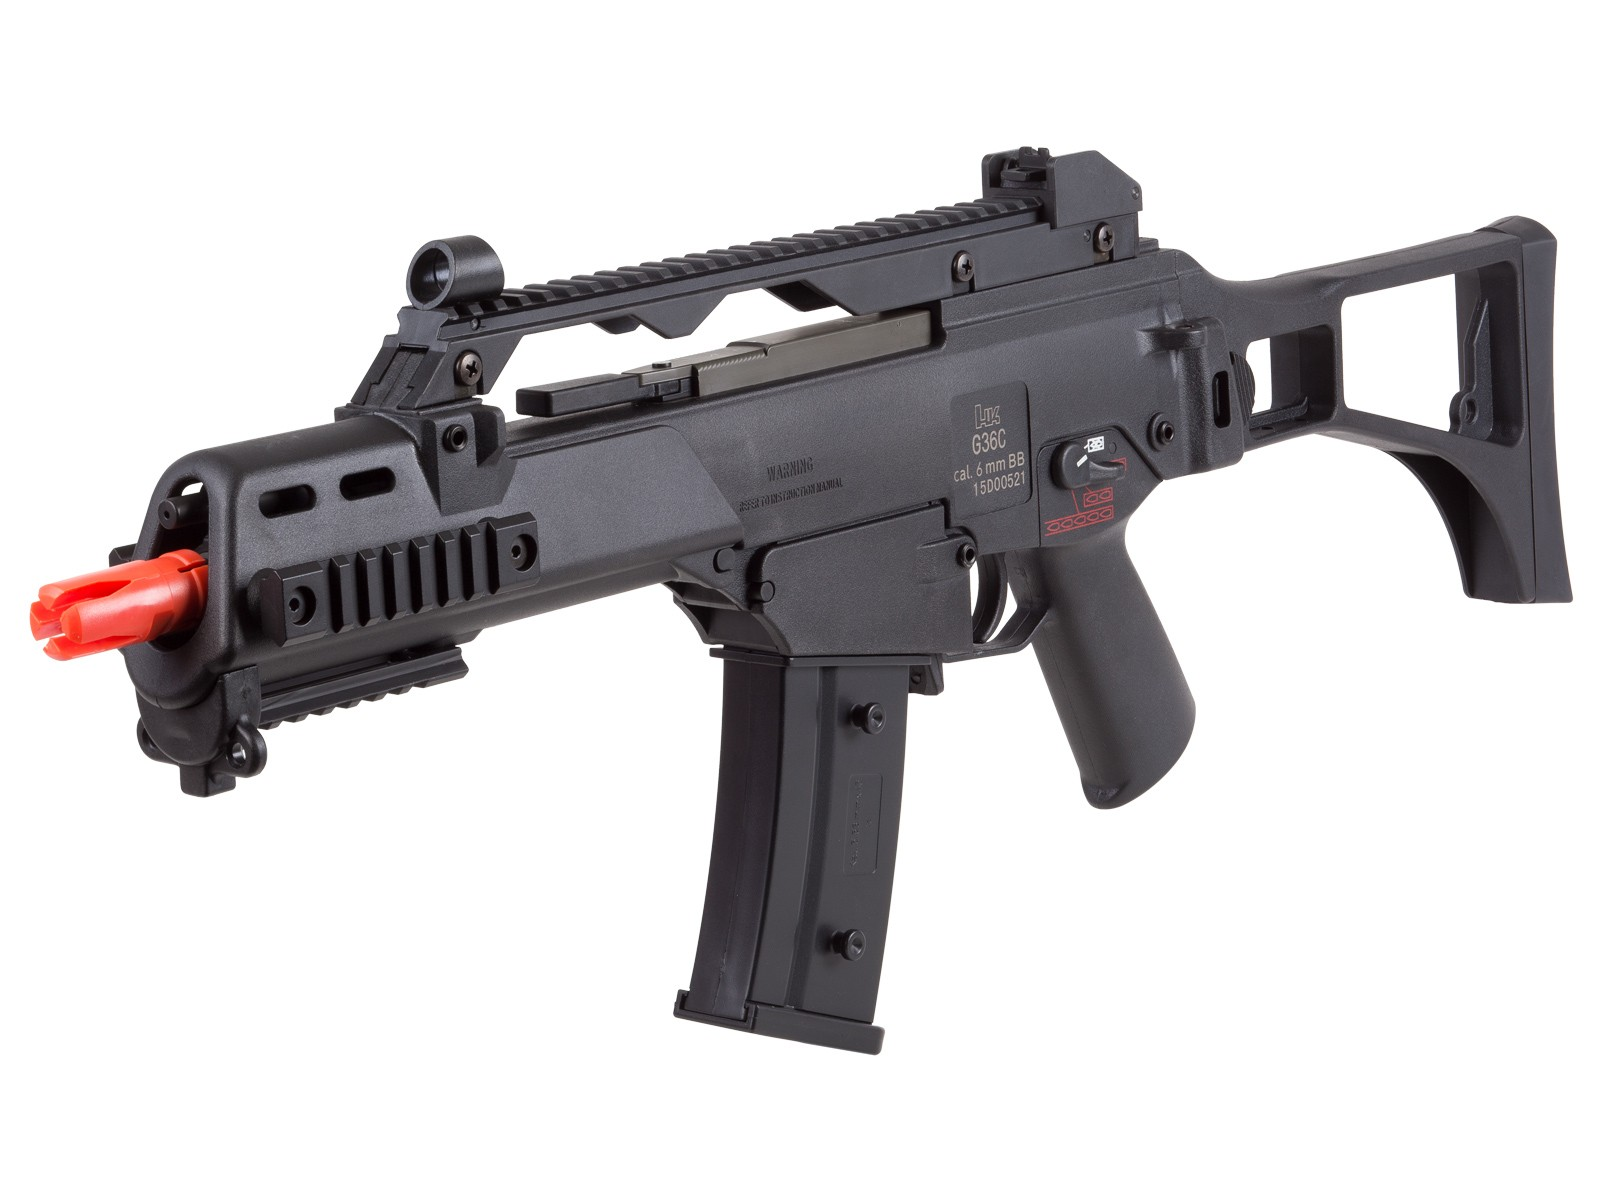 H&K_G36C_AEG_Elite_Airsoft_Rifle_wBuiltIn_MOSFET_6mm